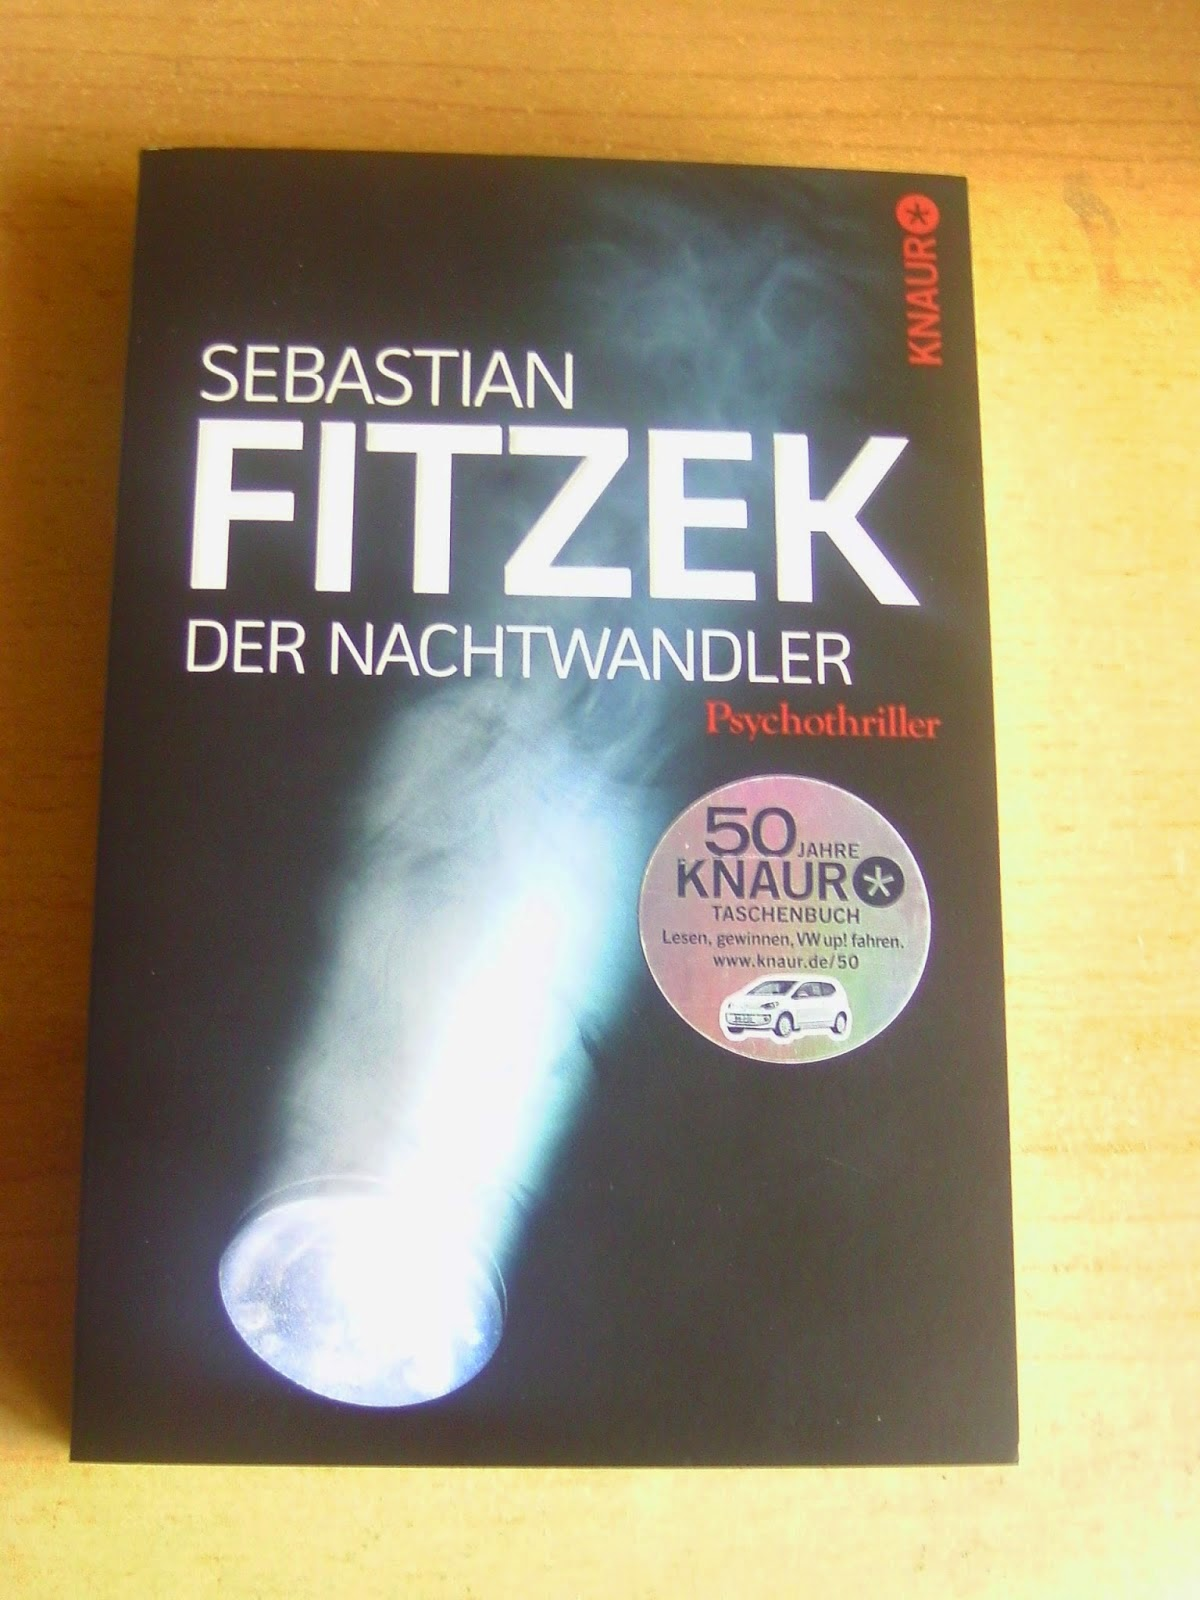 http://www.amazon.de/Nachtwandler-Psychothriller-Sebastian-Fitzek/dp/3426503743/ref=sr_1_1?s=books&ie=UTF8&qid=1430380771&sr=1-1&keywords=Der+Nachtwandler